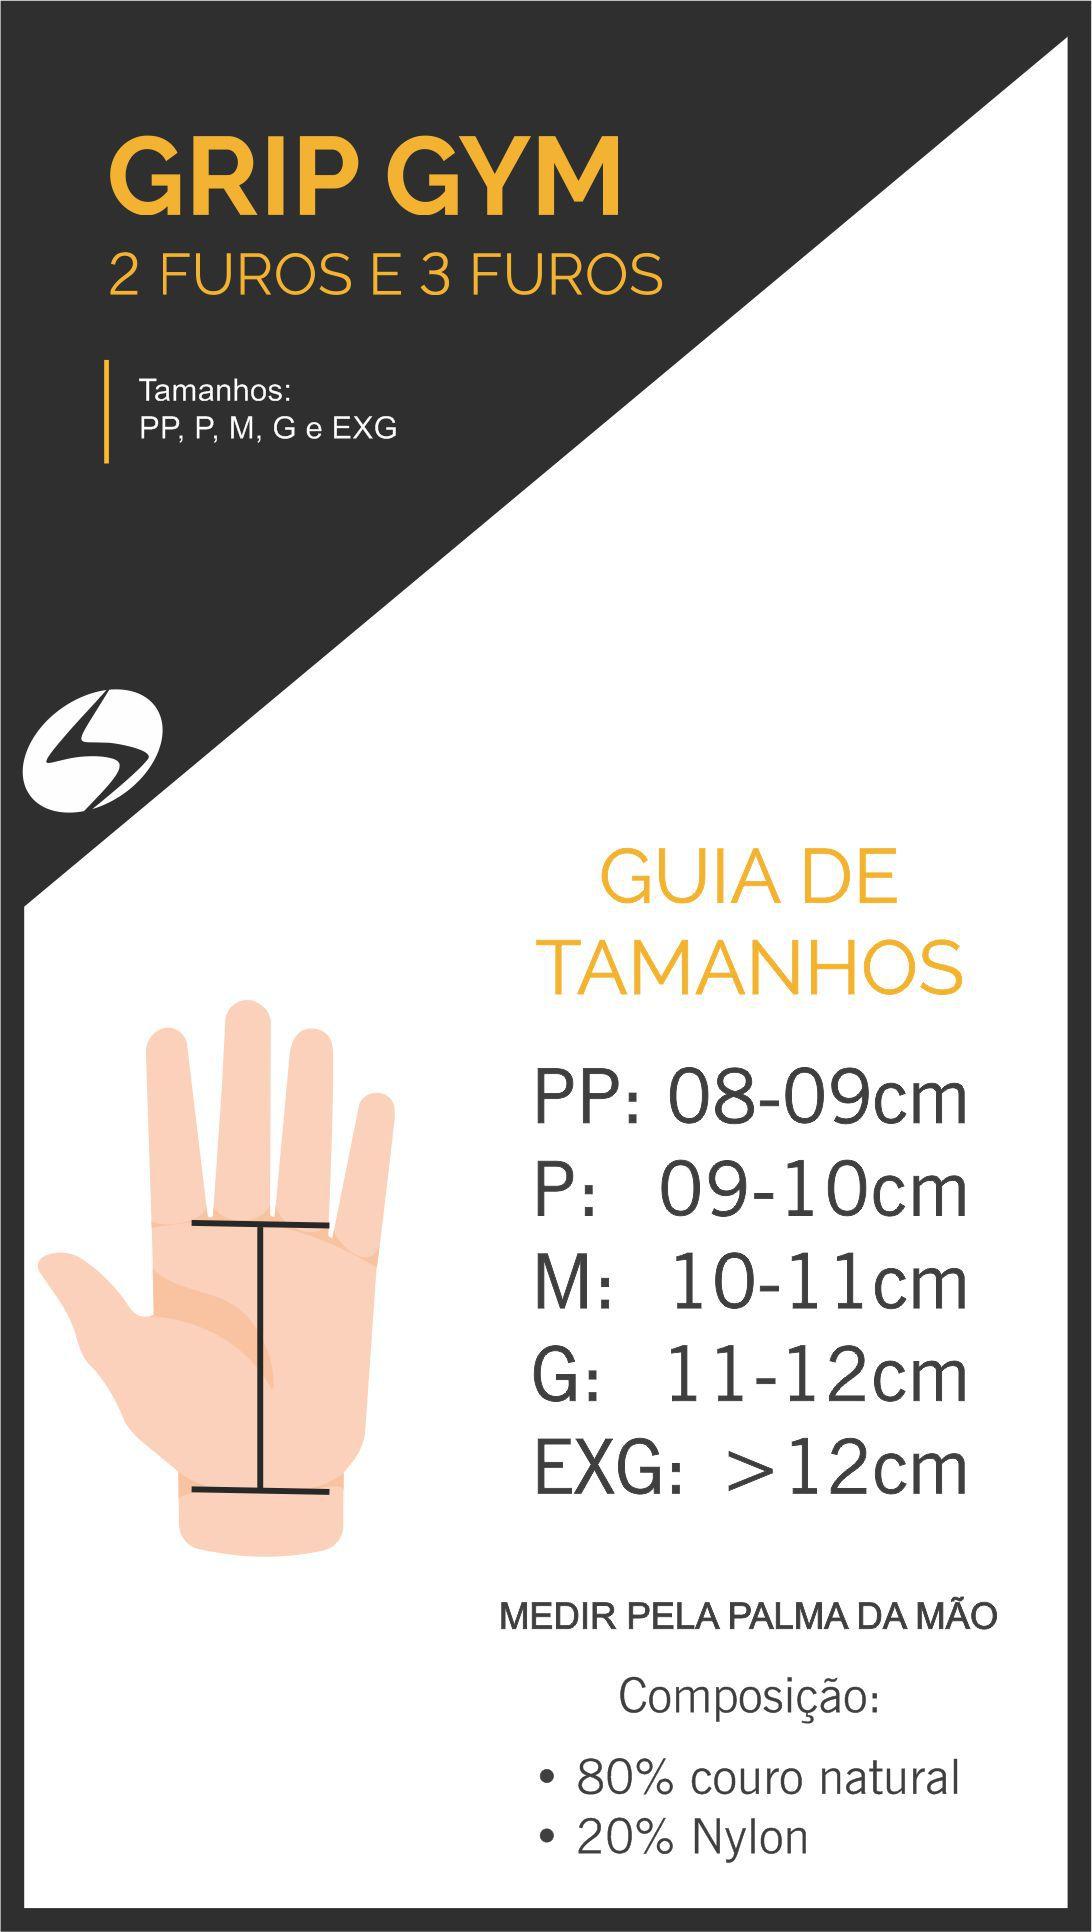 Grip Gym Export 2.0 - Hand Grip - Crossfit - Açaí